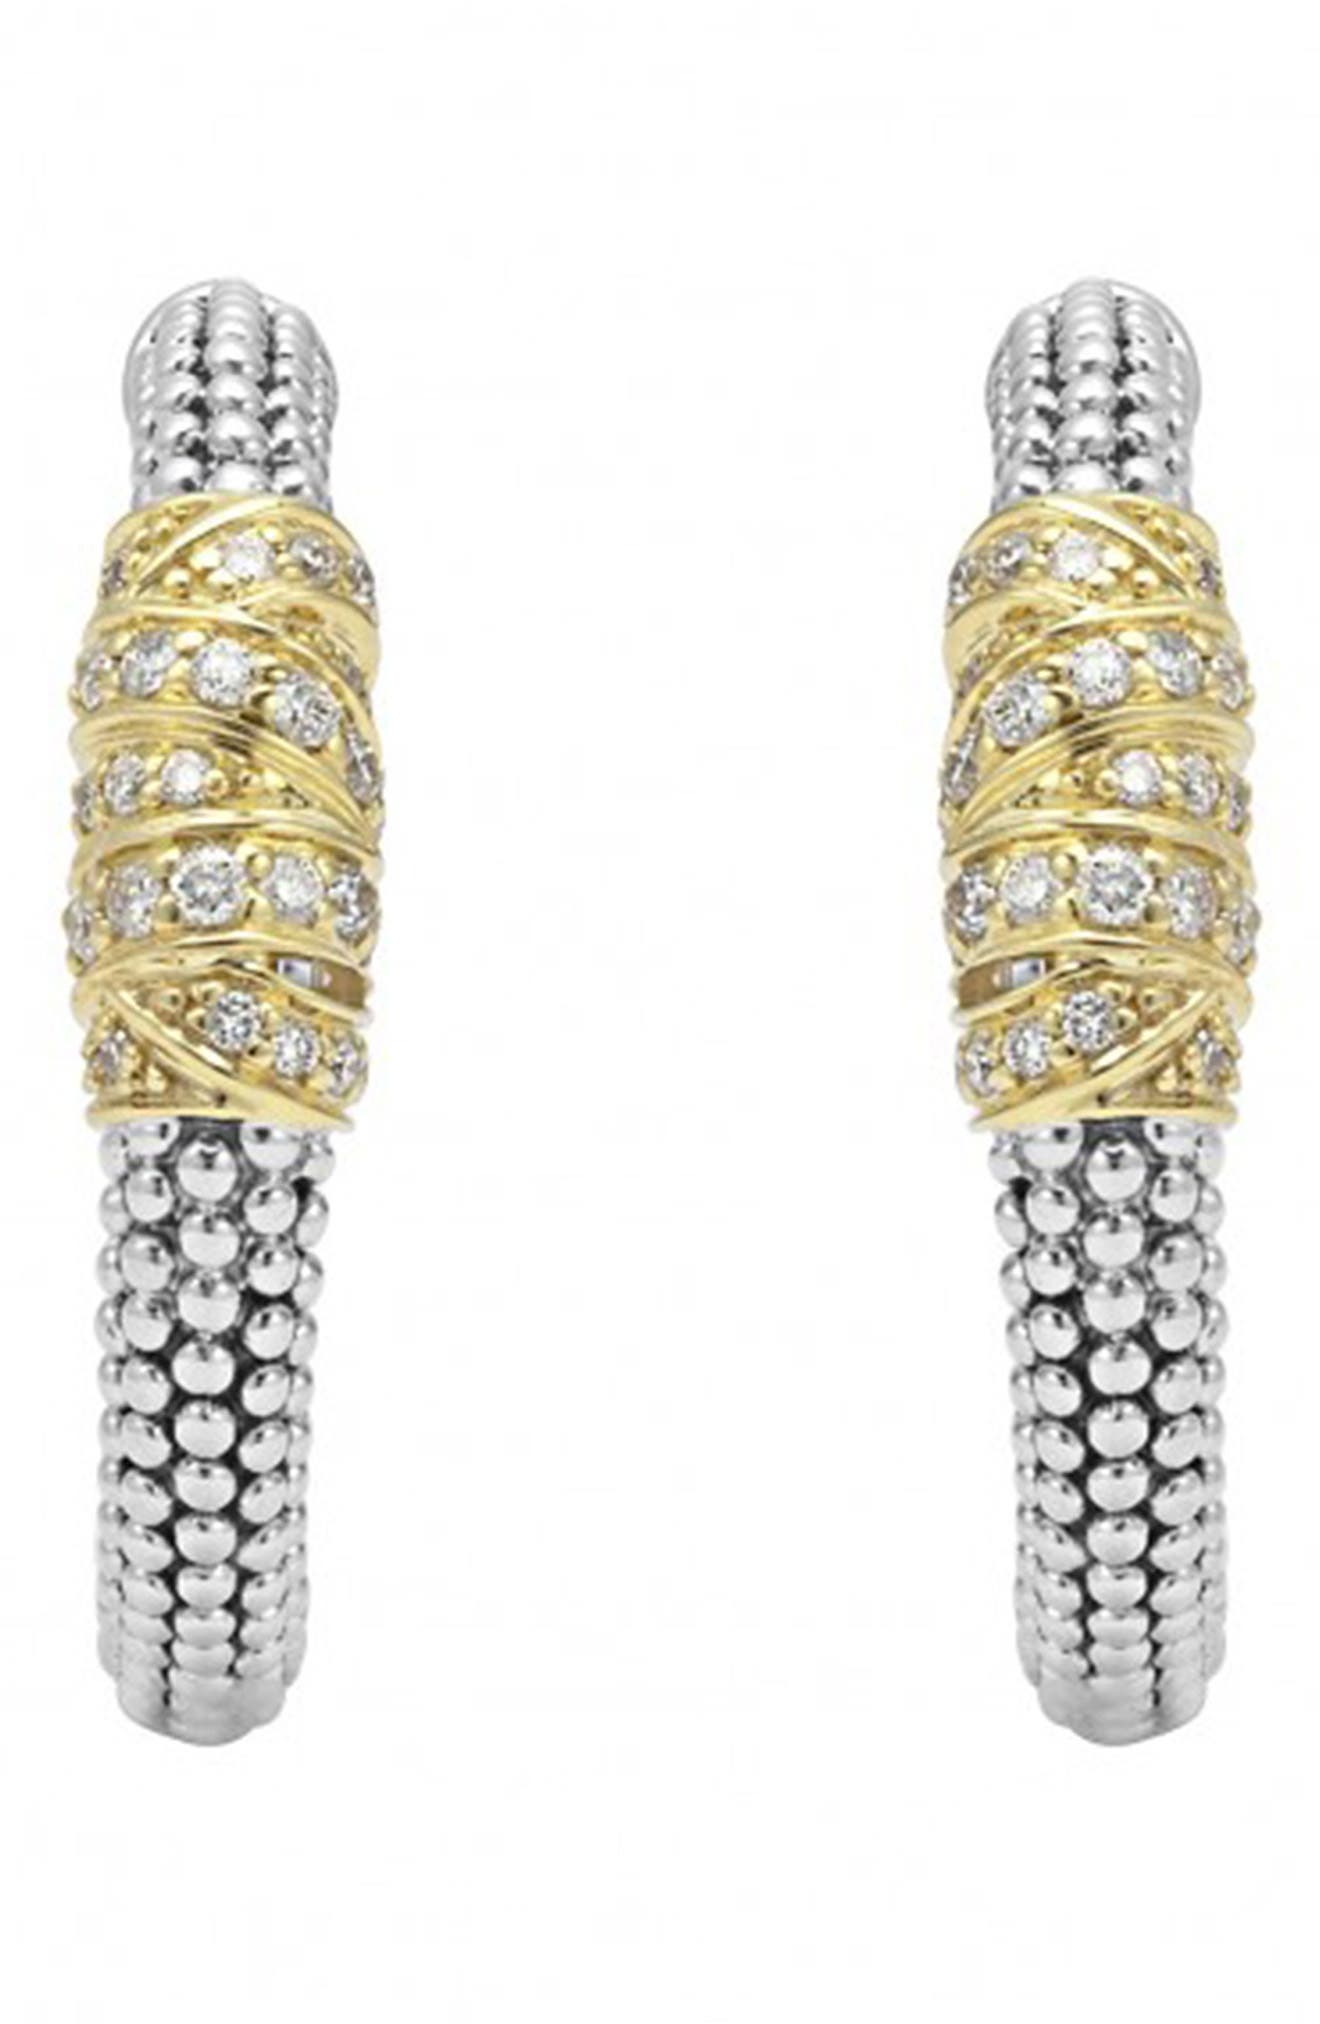 'Embrace' Caviar Diamond Hoop Earrings,                             Alternate thumbnail 2, color,                             Sterling Silver/ Gold